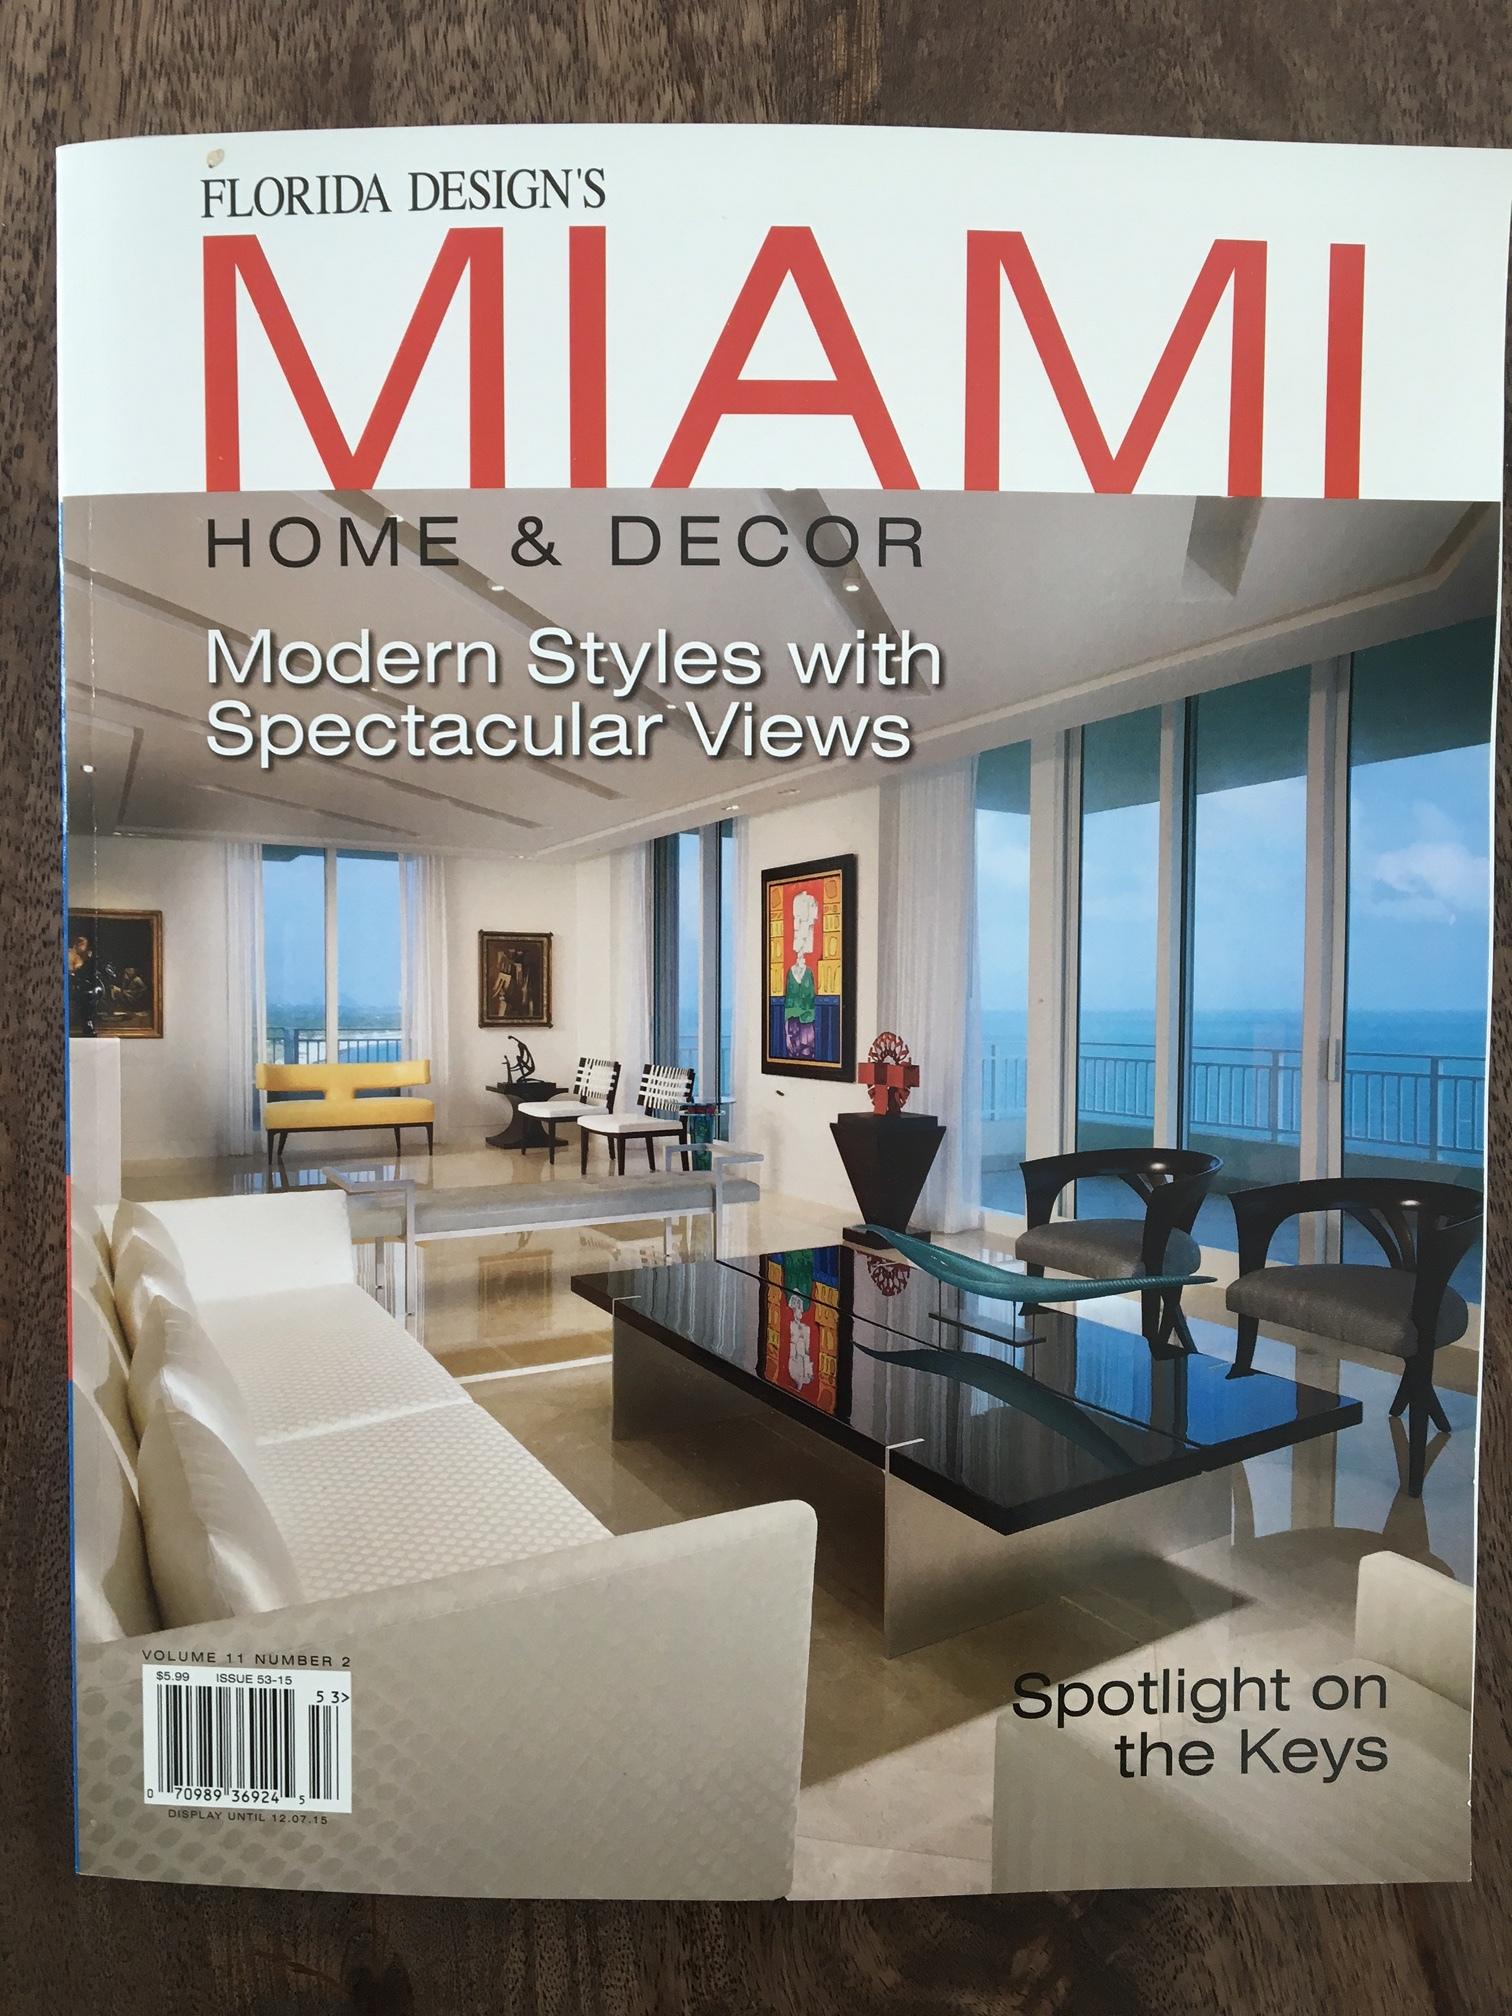 ID_2015 Miami Design December 7.JPG